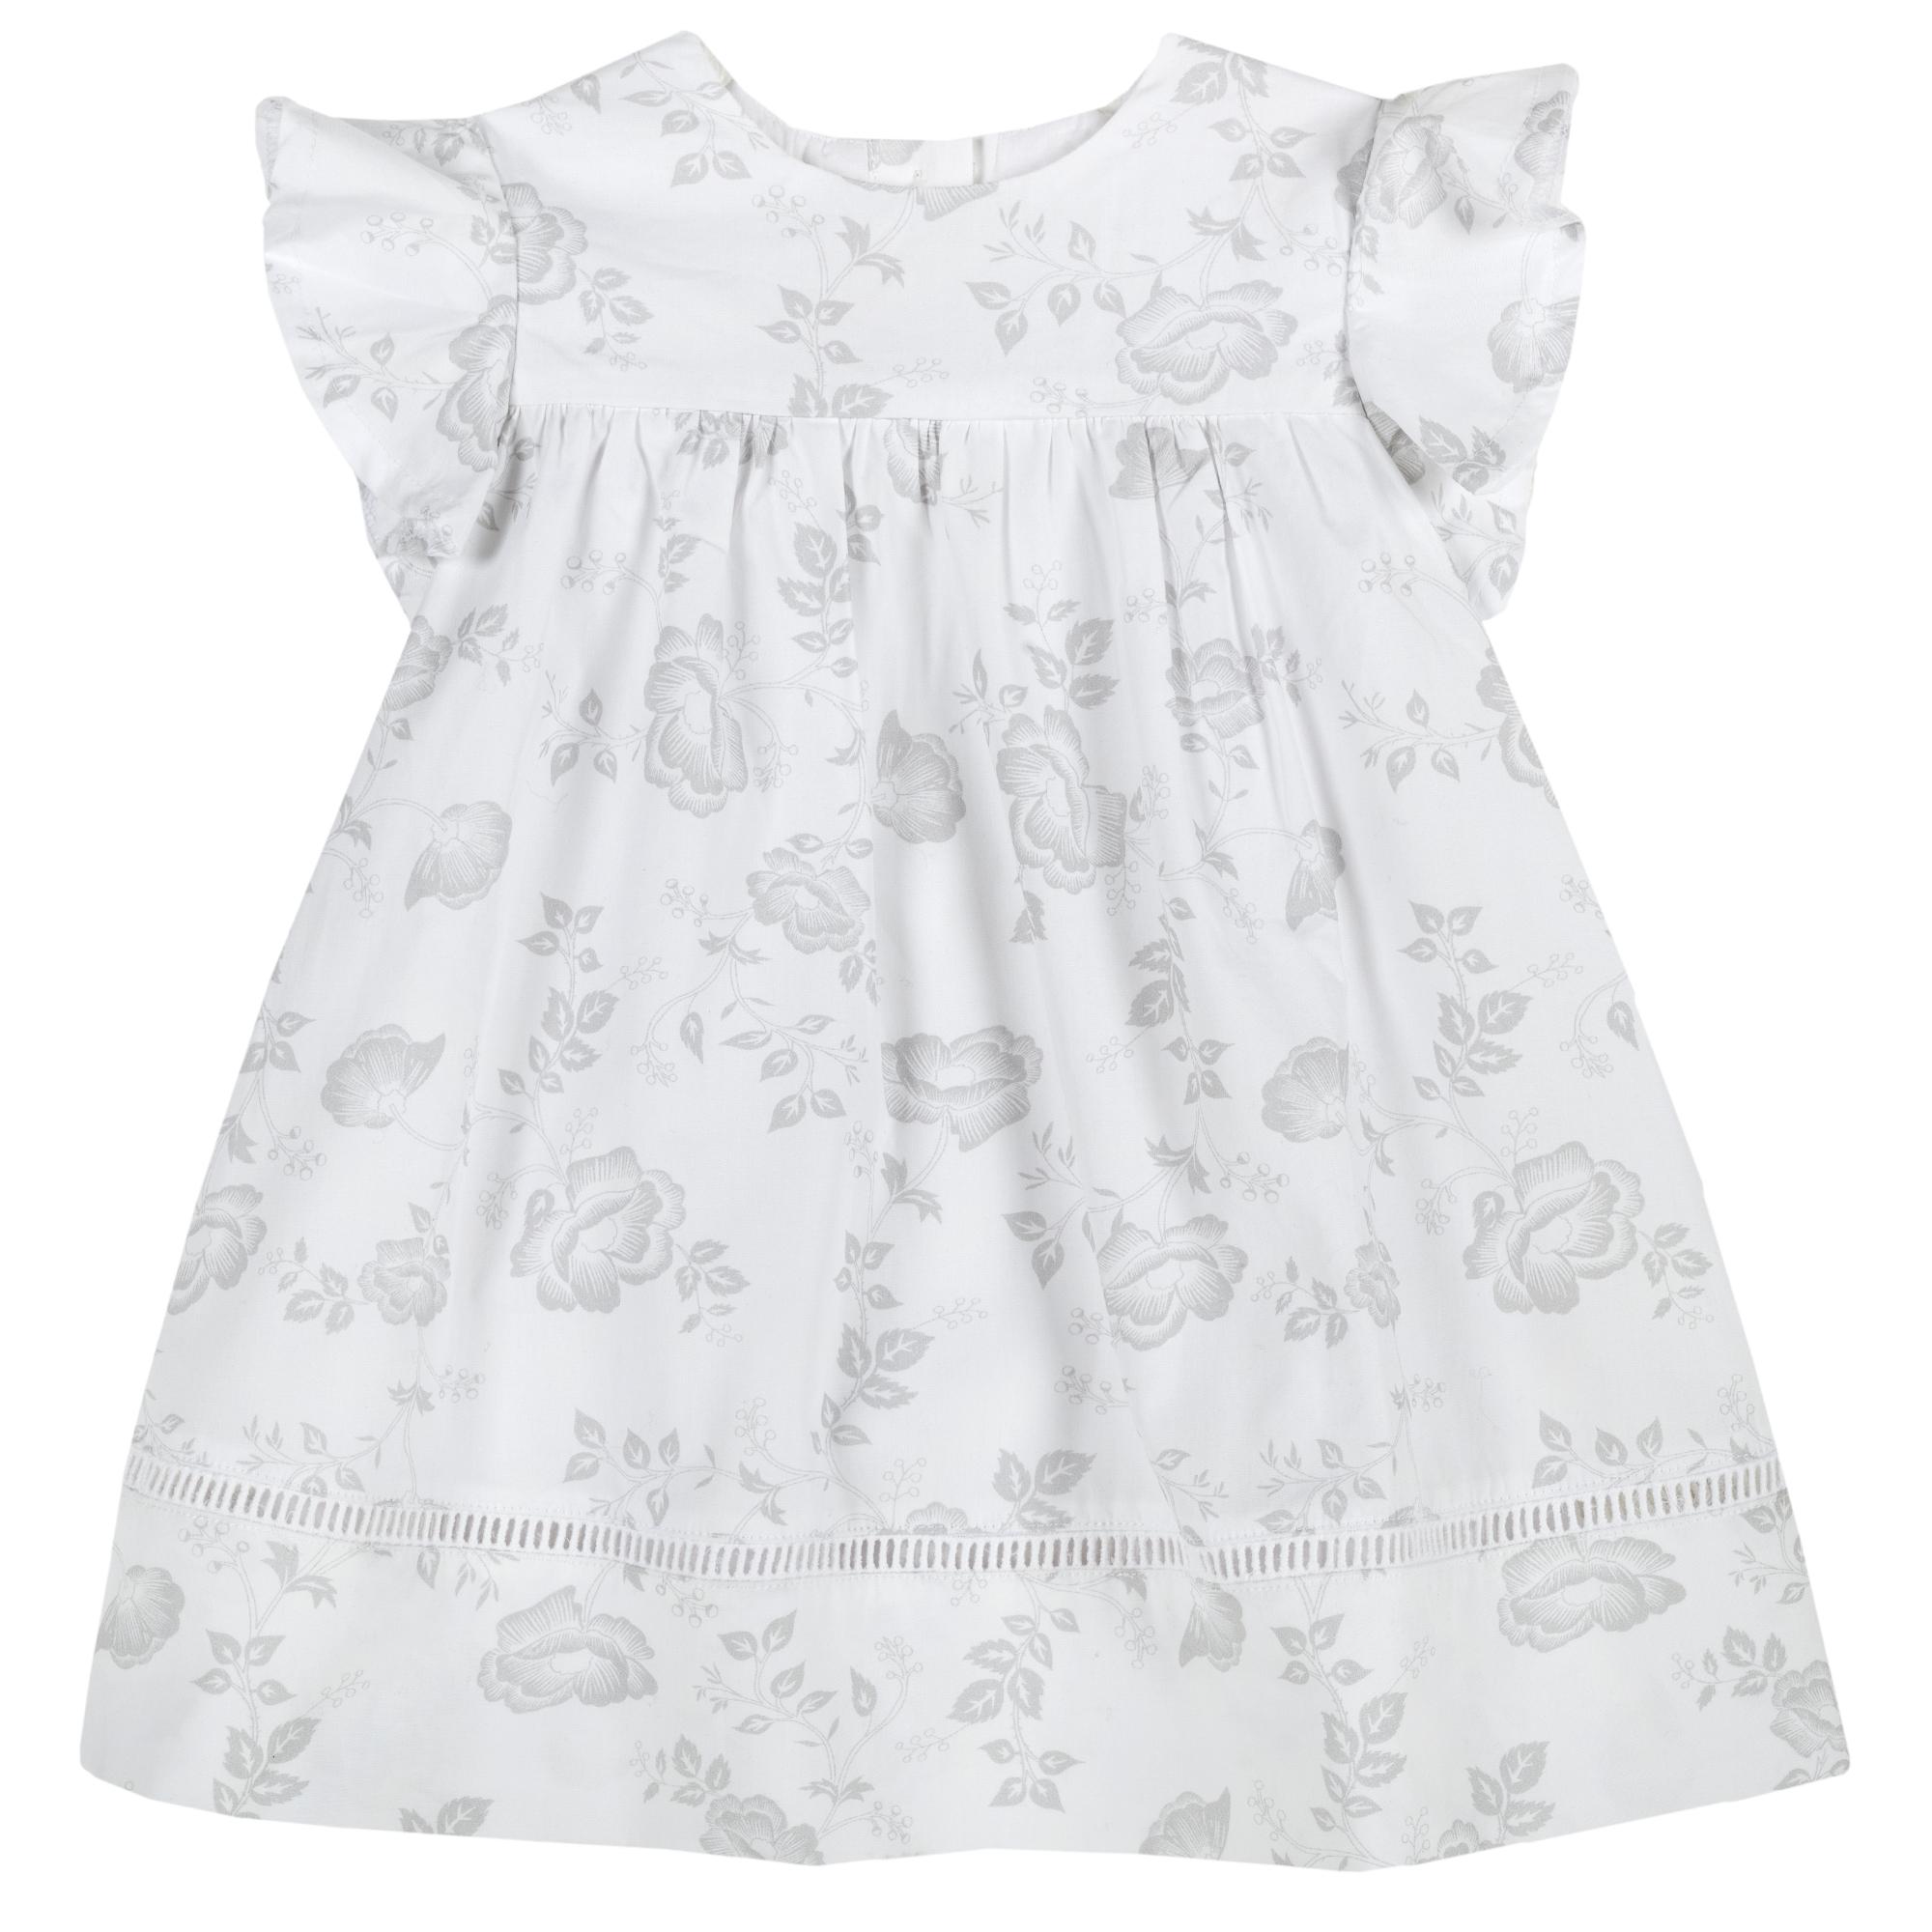 Rochita clos cu volanase Chicco, alb cu floricele gri, 03381